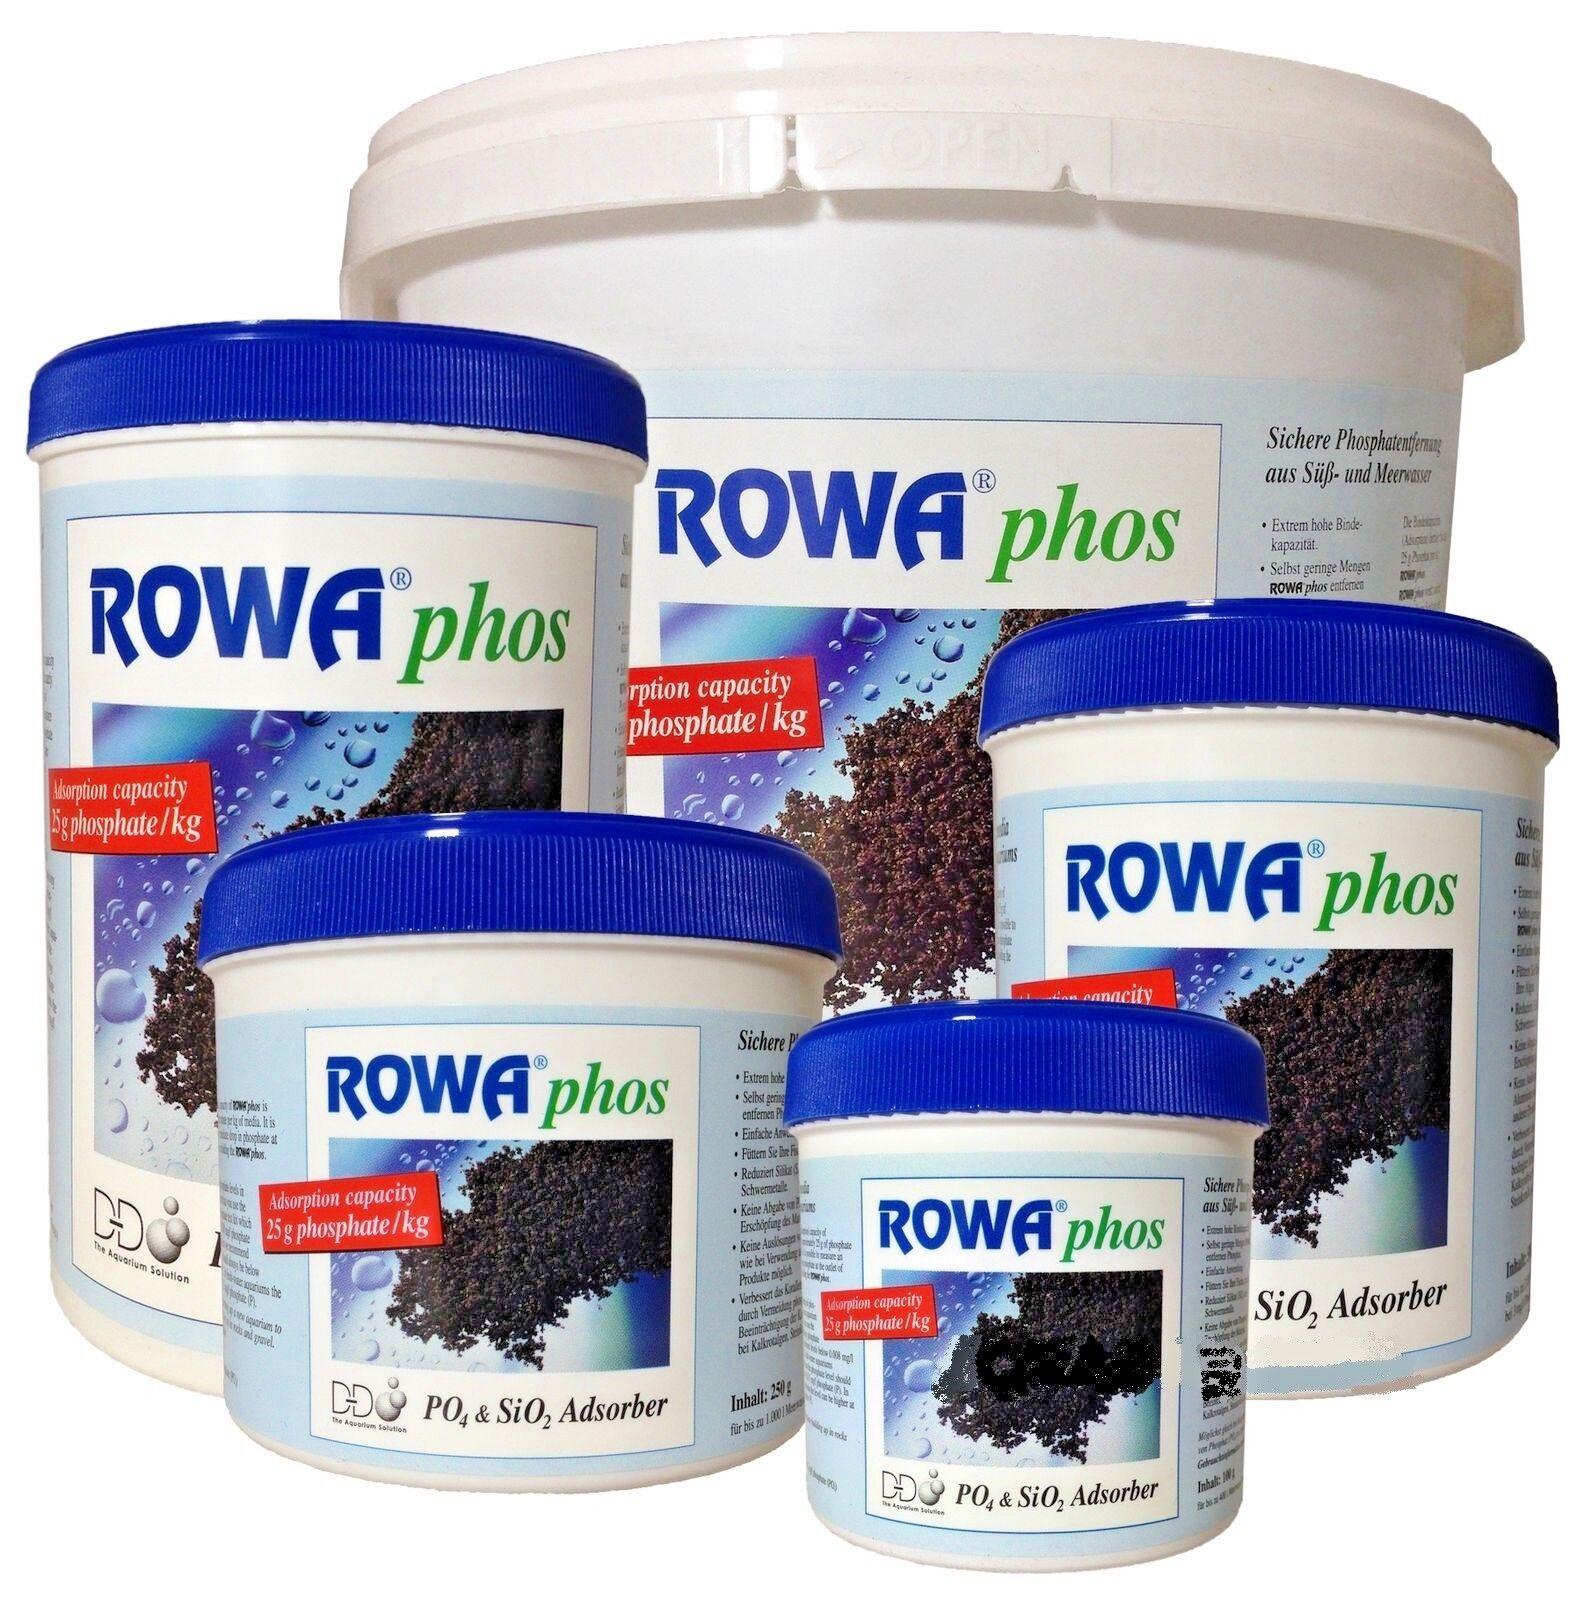 DD ROWAPHOS 100  250  500  1000  5000  ACQUARIO Fosfato Remover GFO